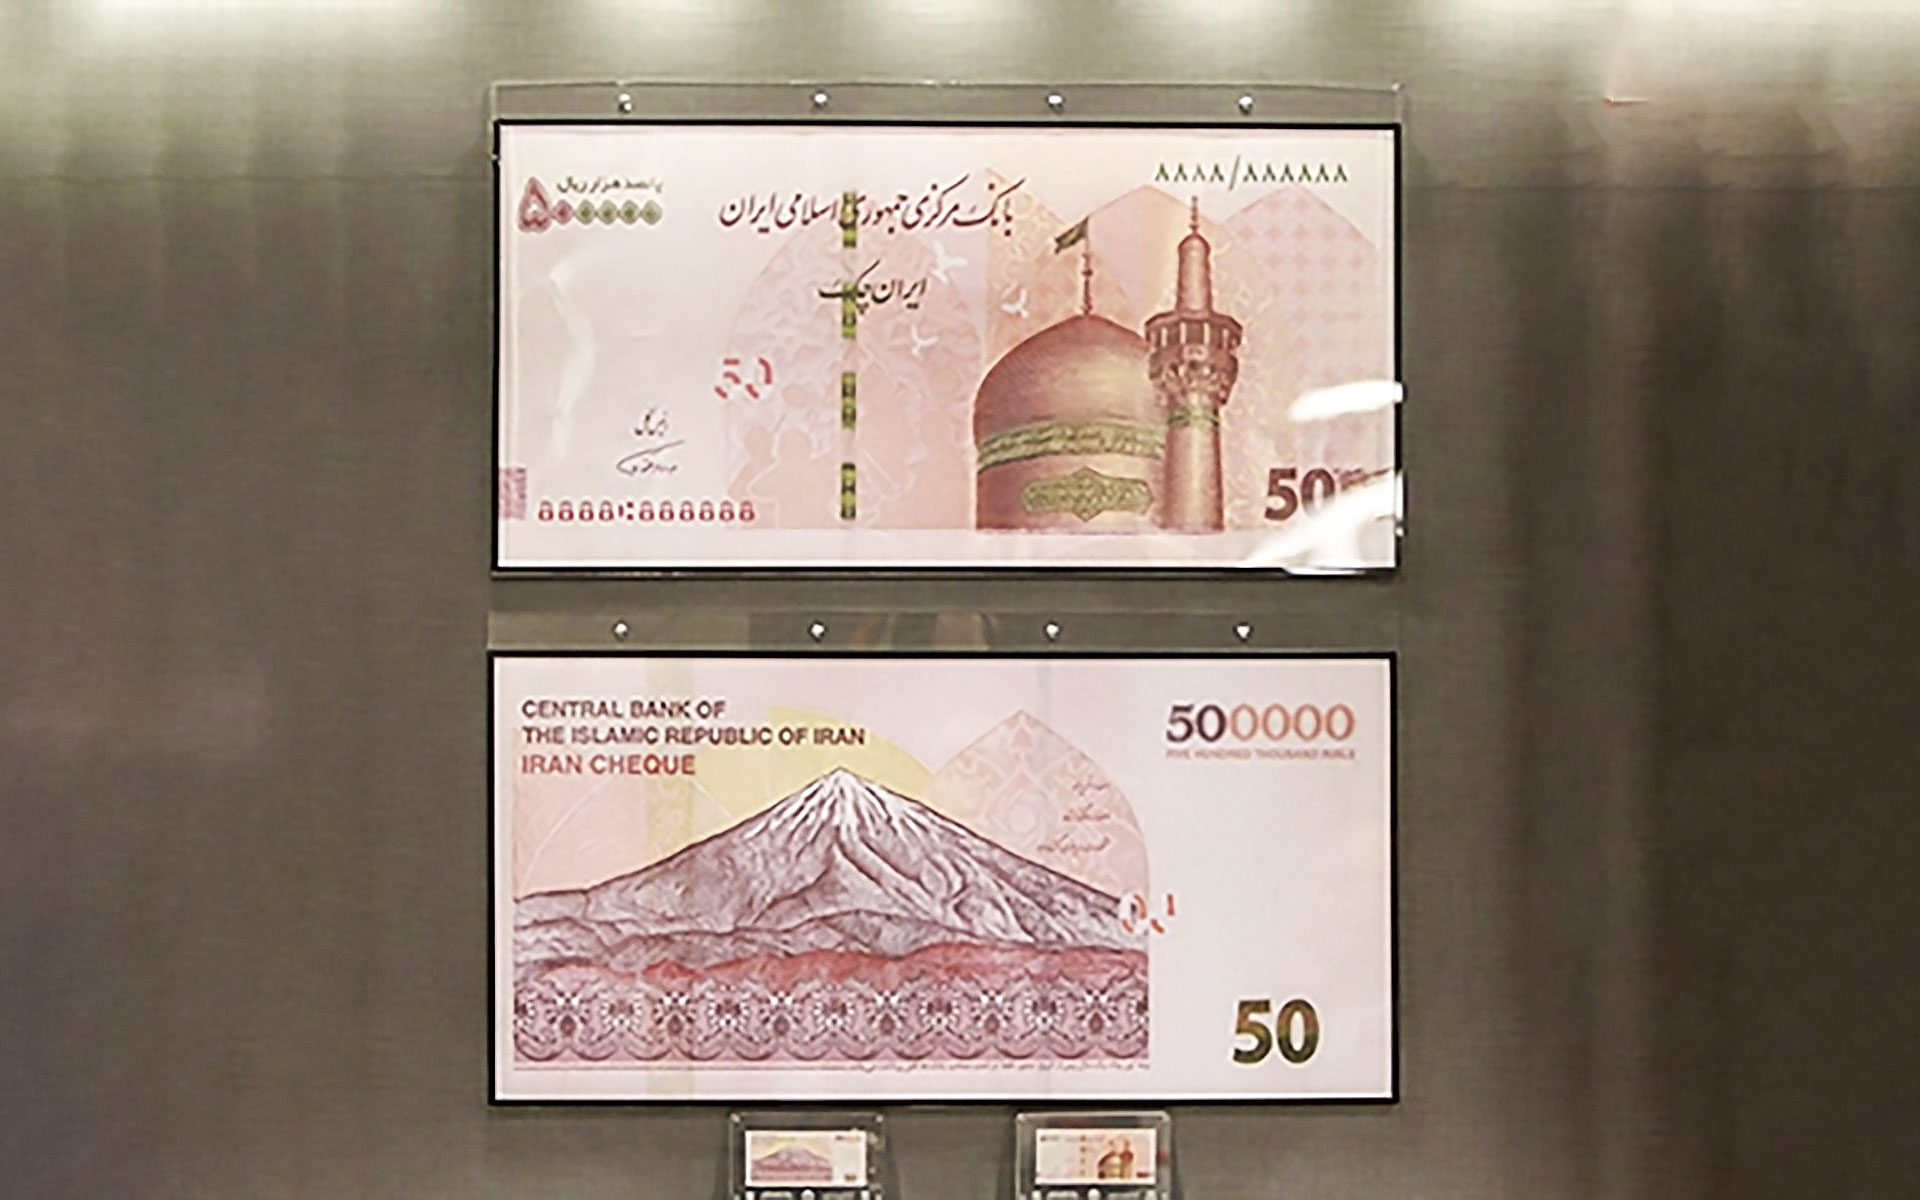 ایران چک ۵۰ هزارتومانی جدید با فناوری چاپ اسکناس یورو